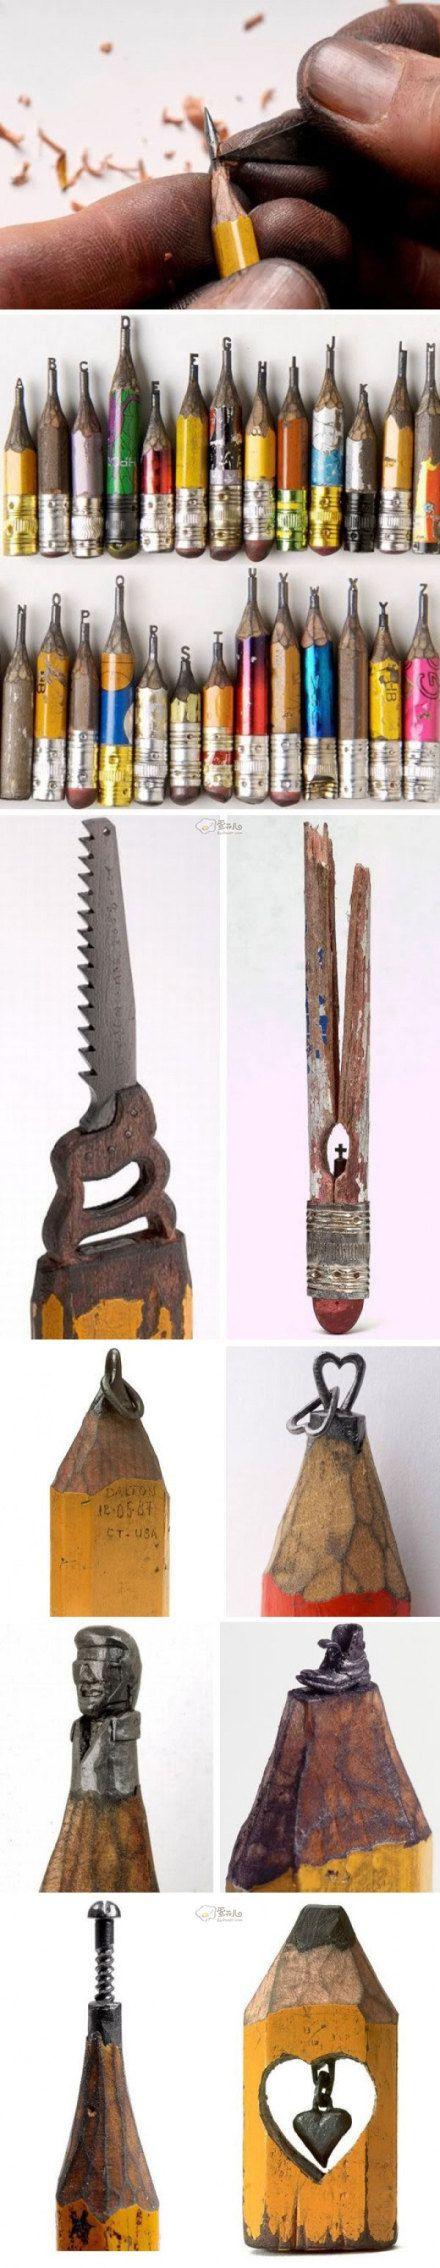 Miniature Art on the Tip of Pencil by Dalton Ghetti ~~~